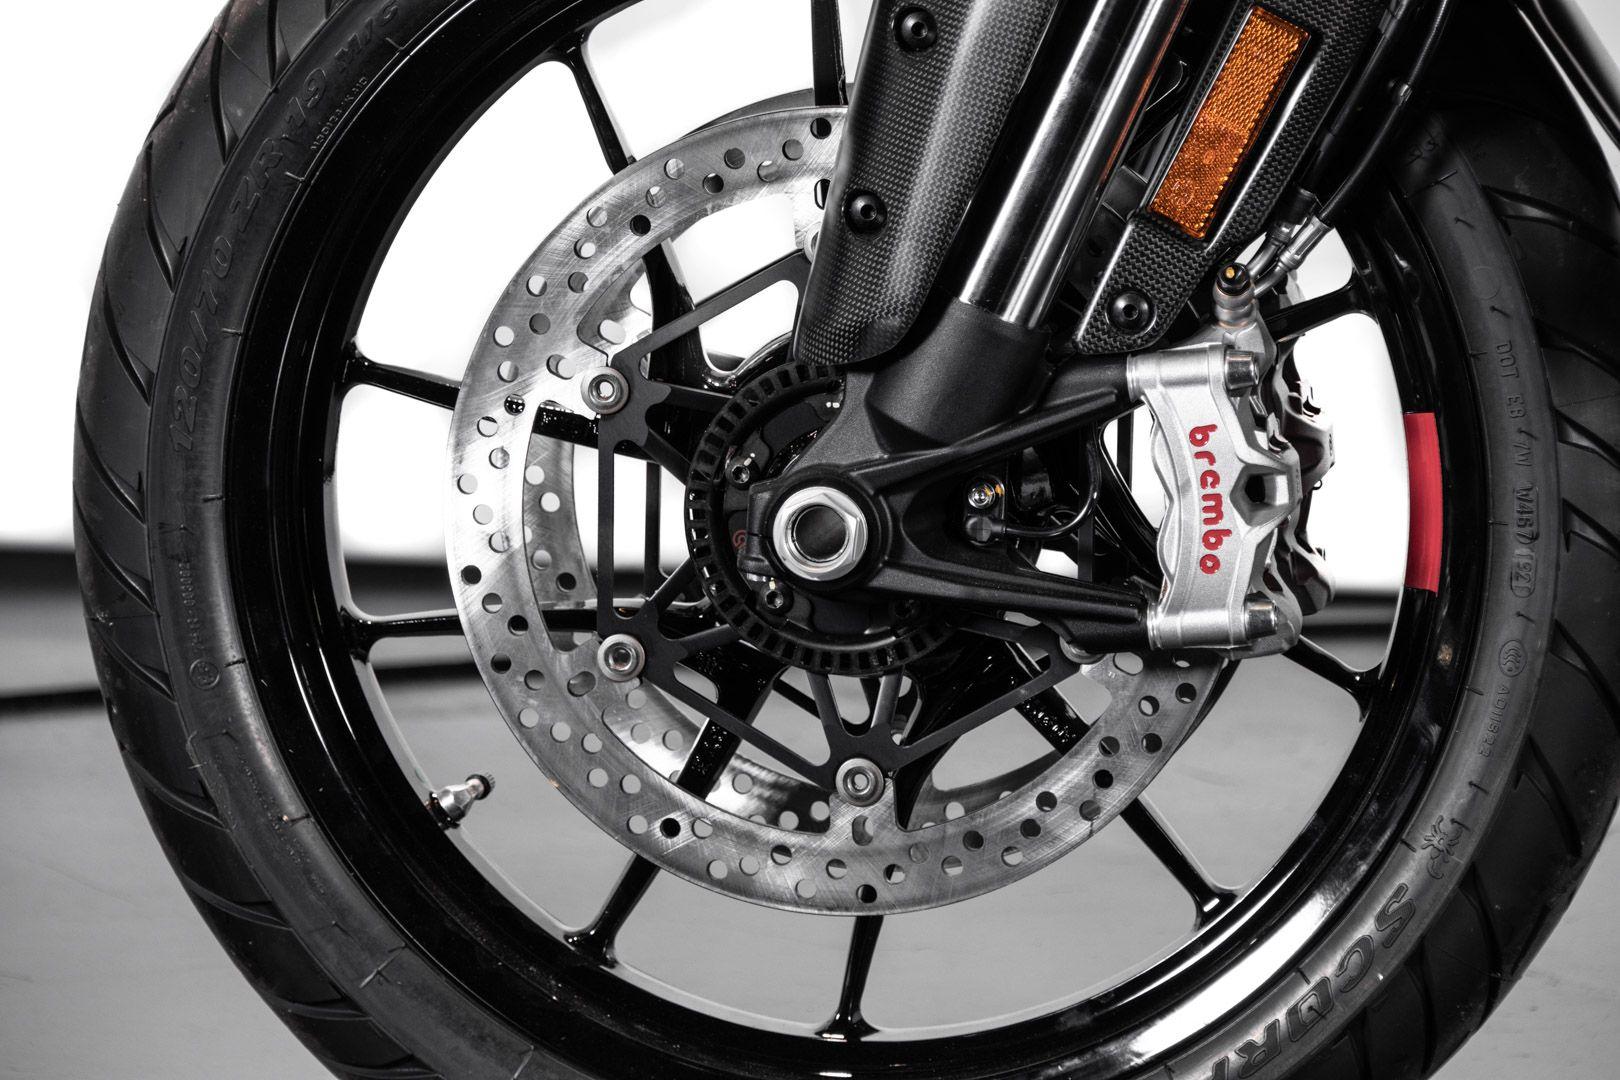 2021 Ducati MULTISTRADA V4 AVIATOR GREY FULL 84040